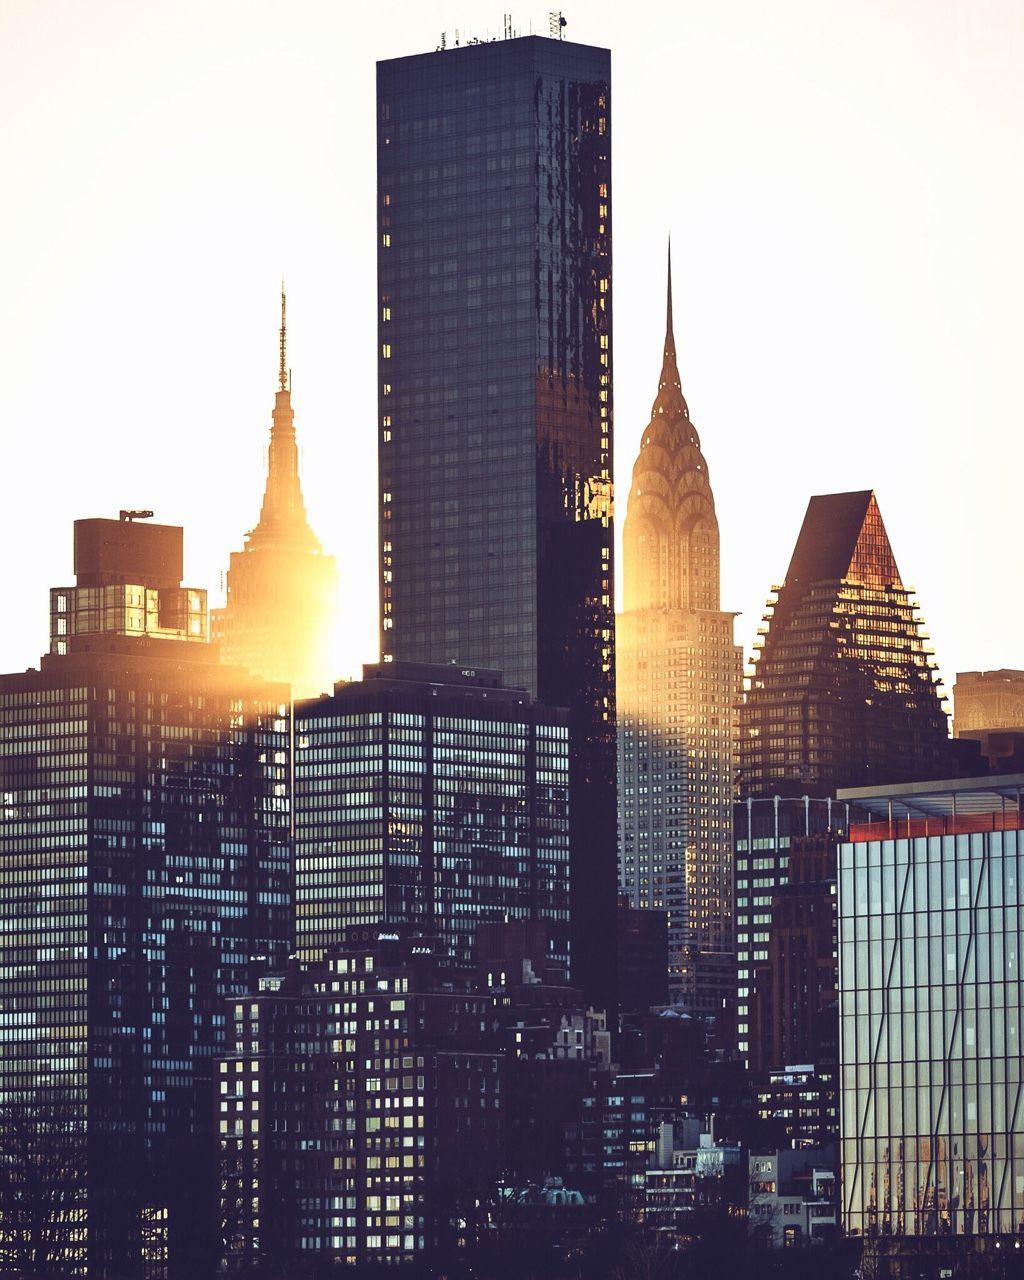 Beautiful shot of Midtown Manhattan skyline by Paul Seibert @pseibertphoto | via newyorkcityfeelings.com - The Best Photos and Videos of New York City including the Statue of Liberty Brooklyn Bridge Central Park Empire State Building Chrysler Building and other popular New York places and attractions.